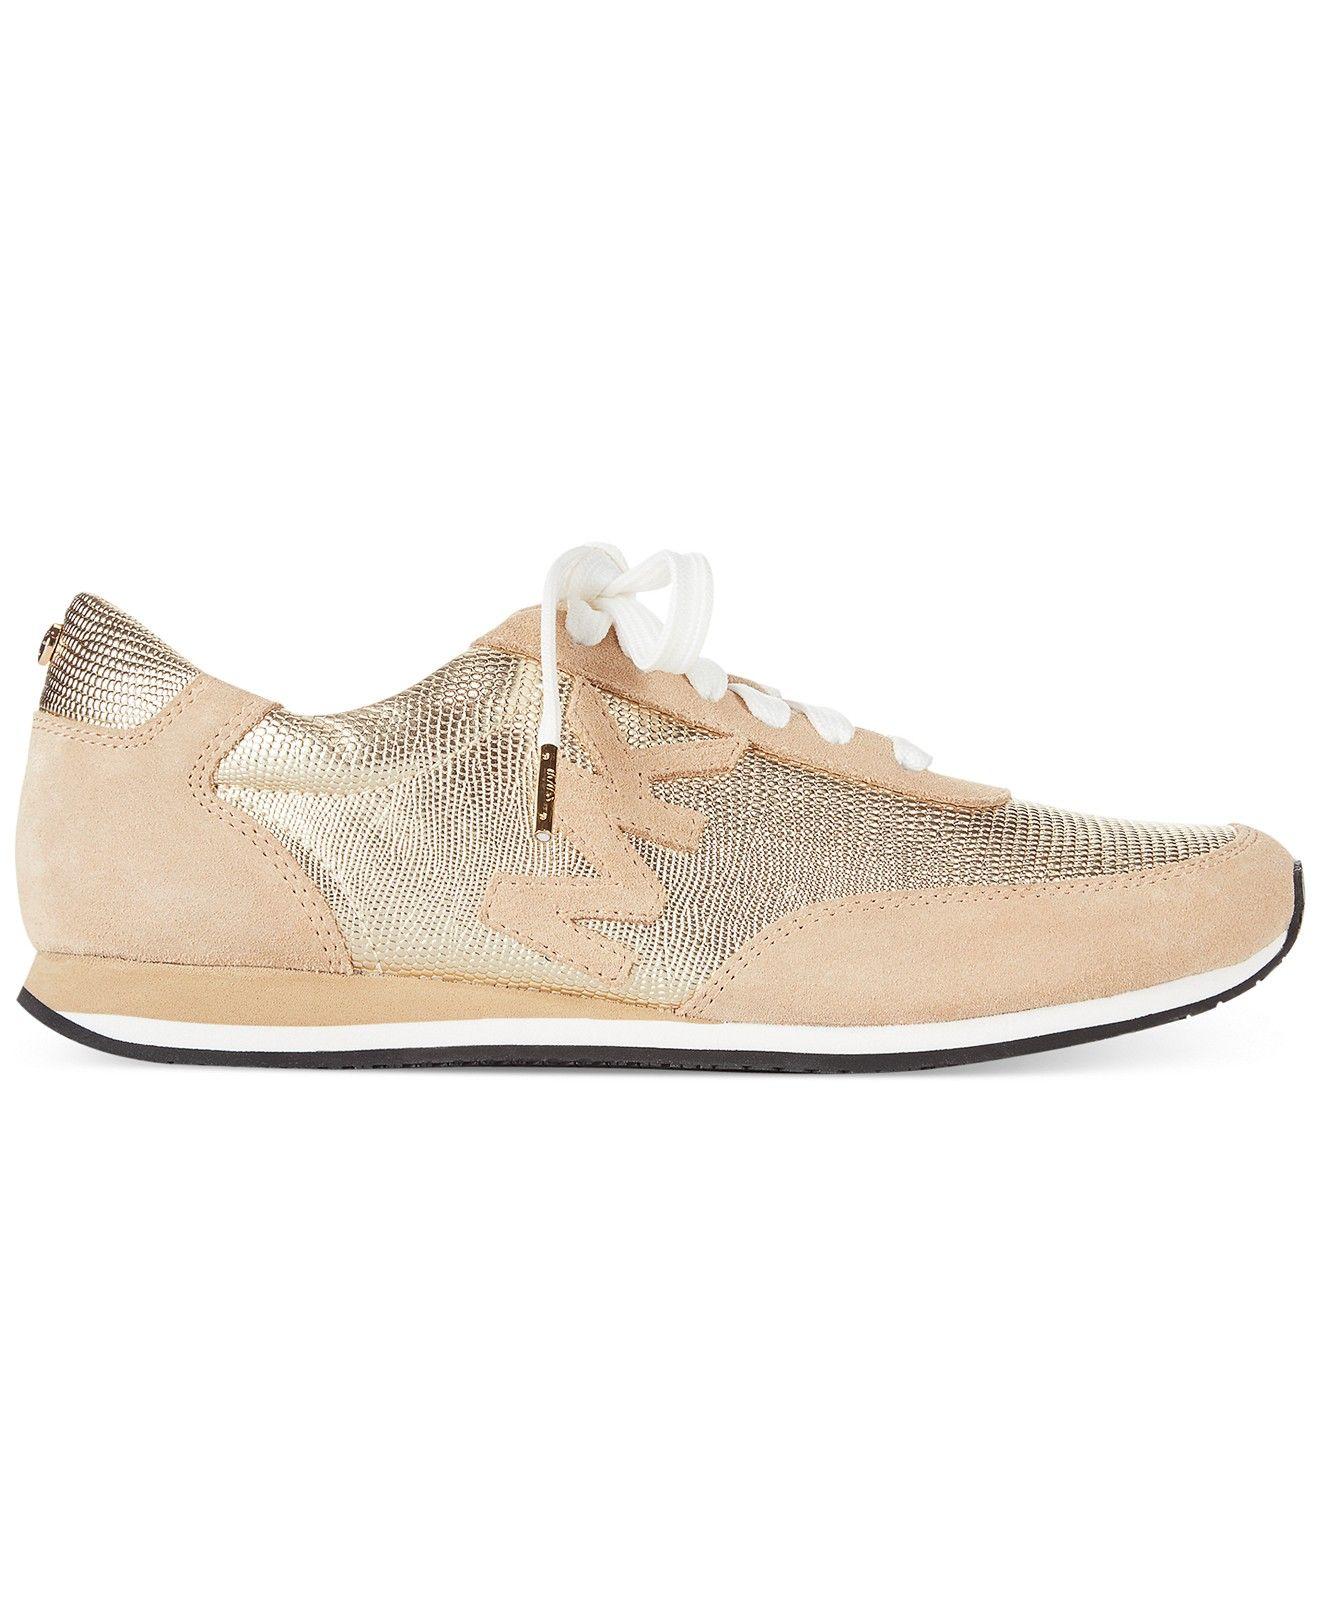 daaec36b97c6 MICHAEL Michael Kors Stanton Trainer Sneakers - Shoes - Macy s ...